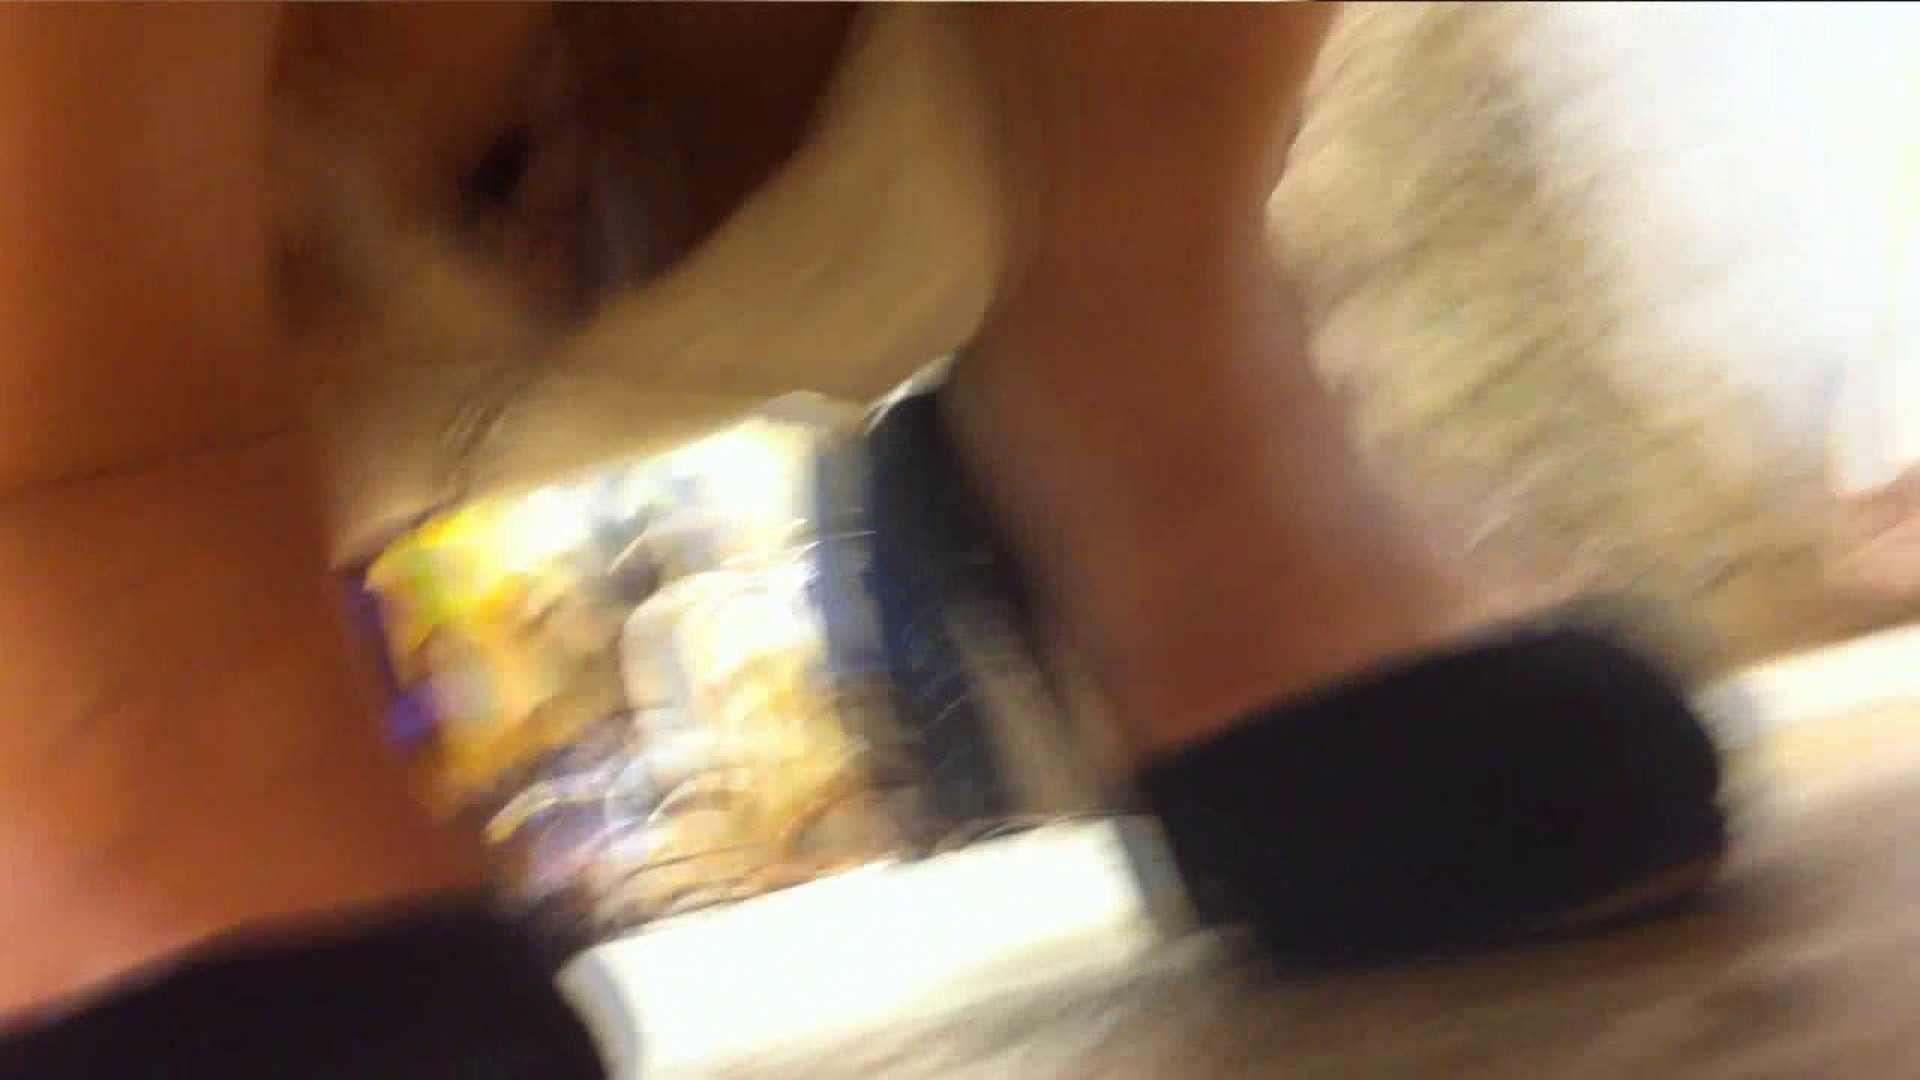 vol.40 美人アパレル胸チラ&パンチラ もっこりパンチラ! 胸チラ 覗きおまんこ画像 109PICs 16